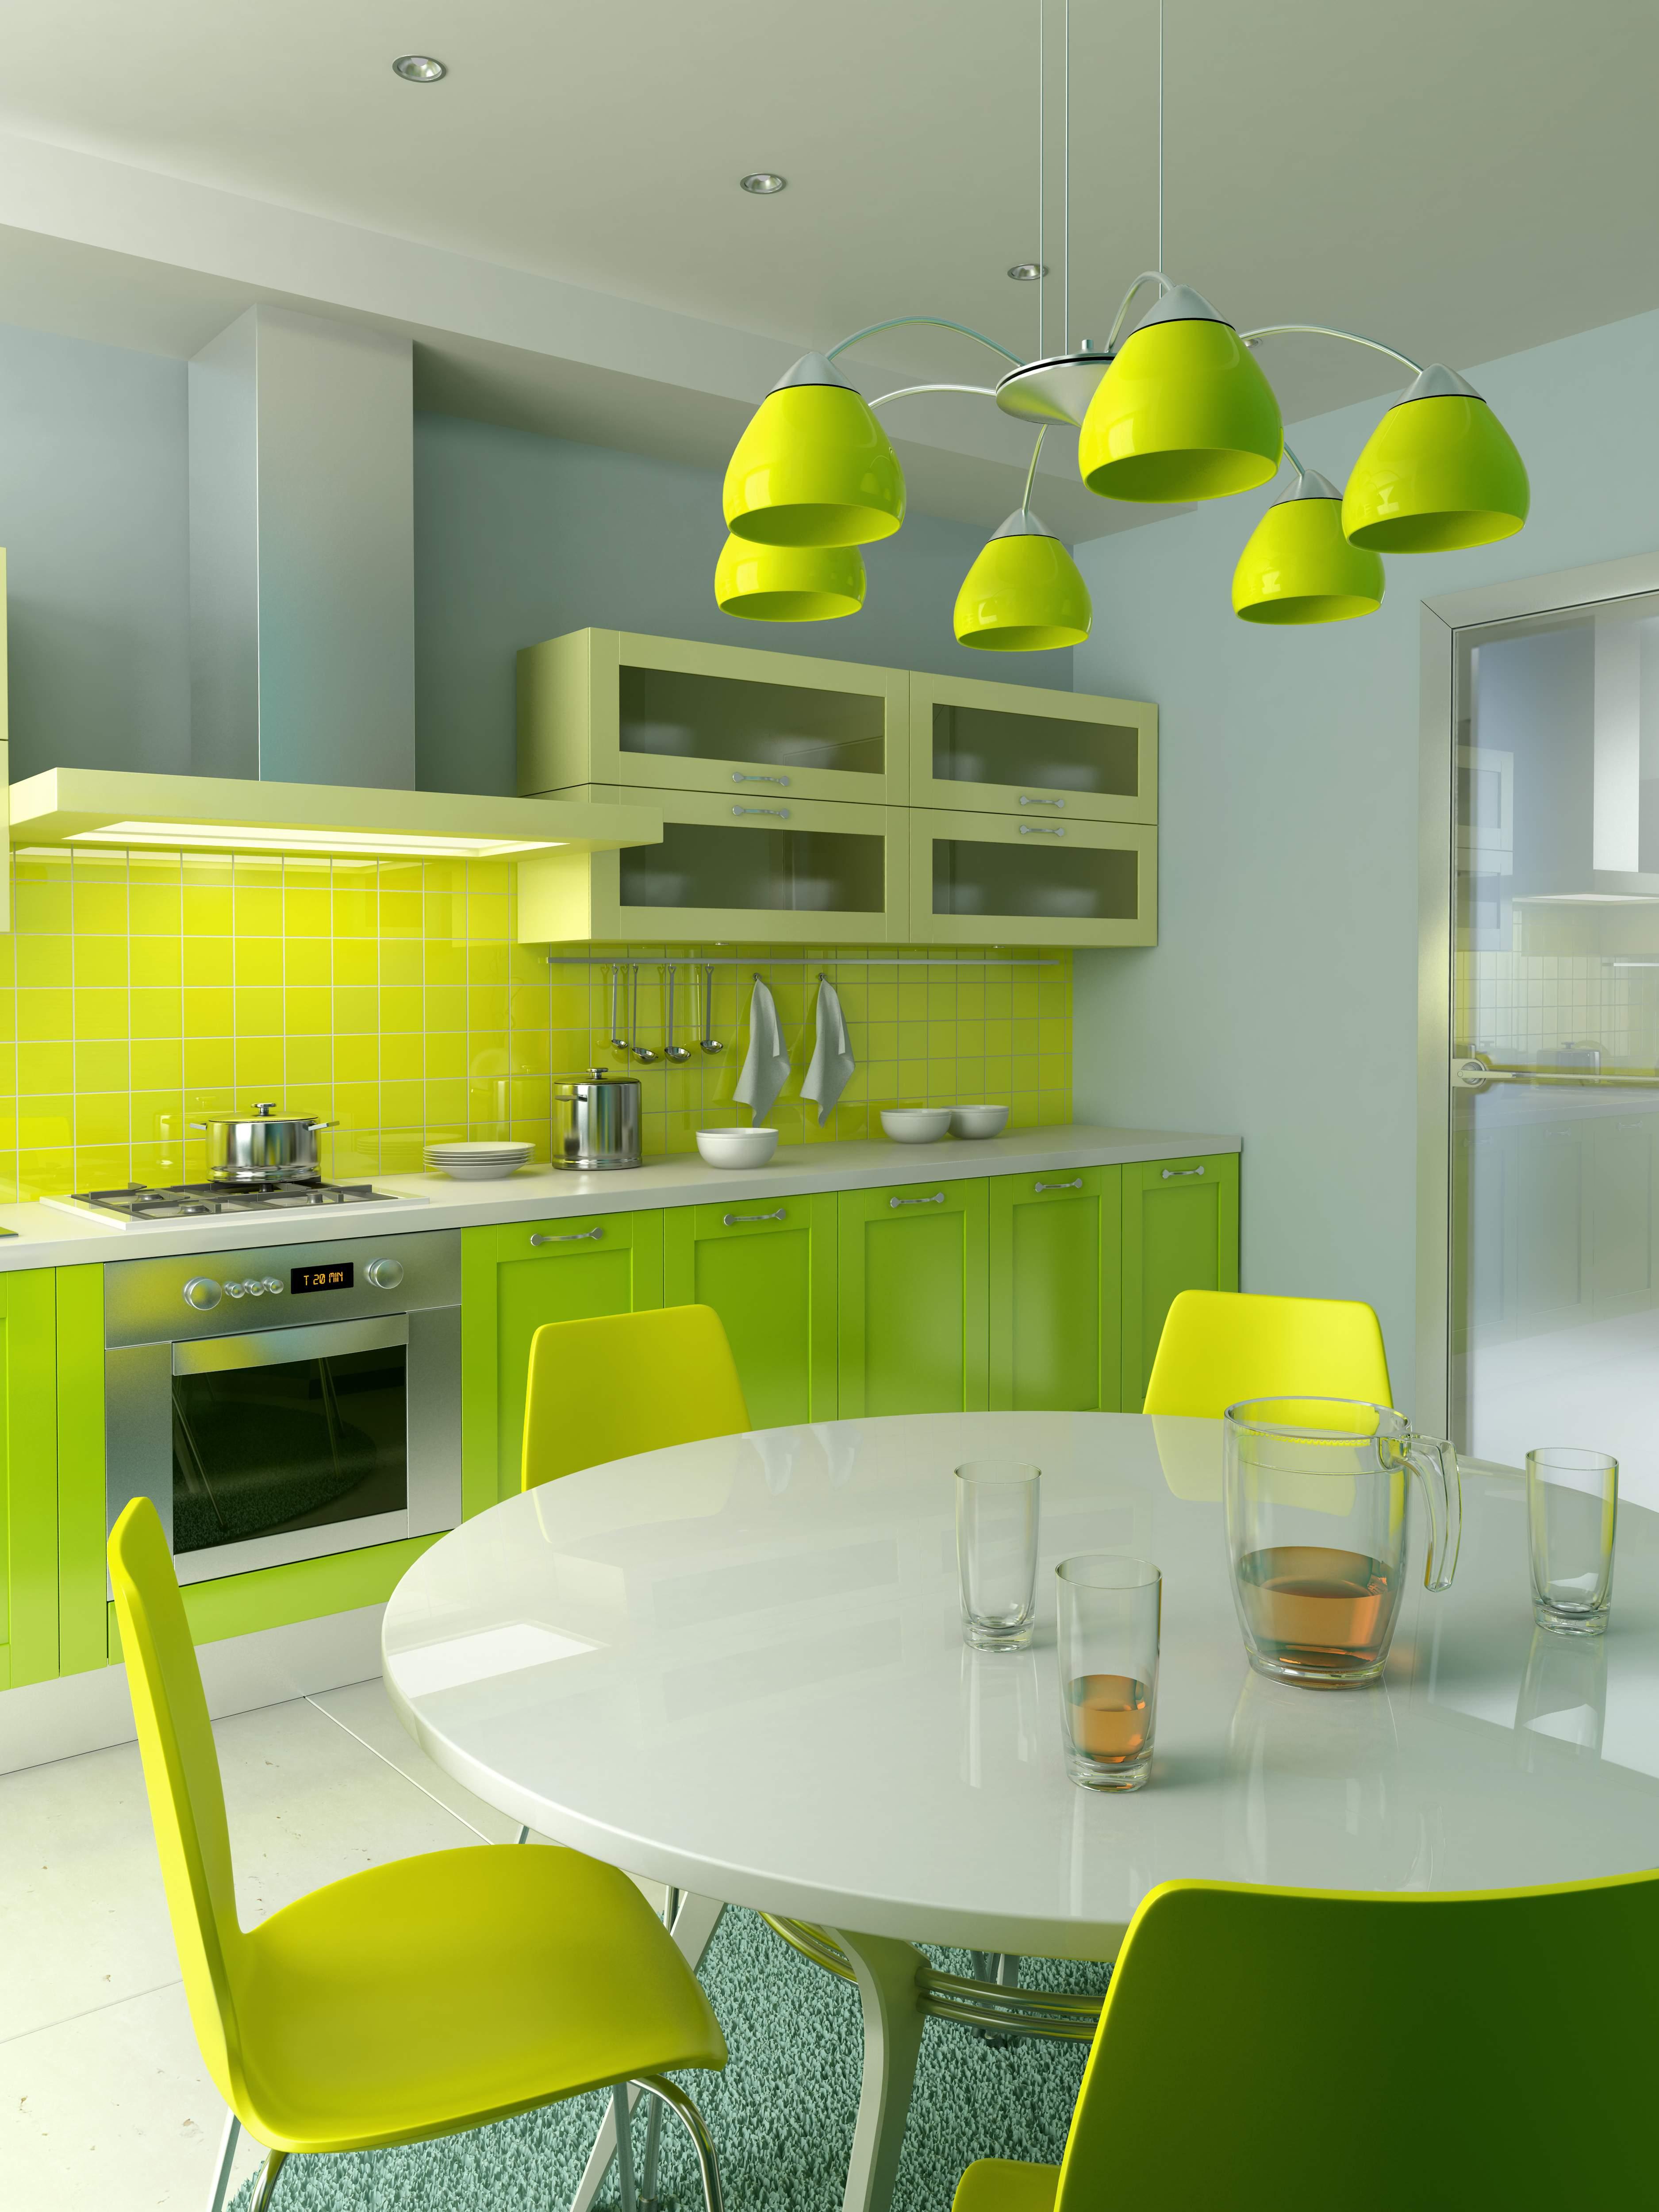 Kitchen stool chairs photo - 3